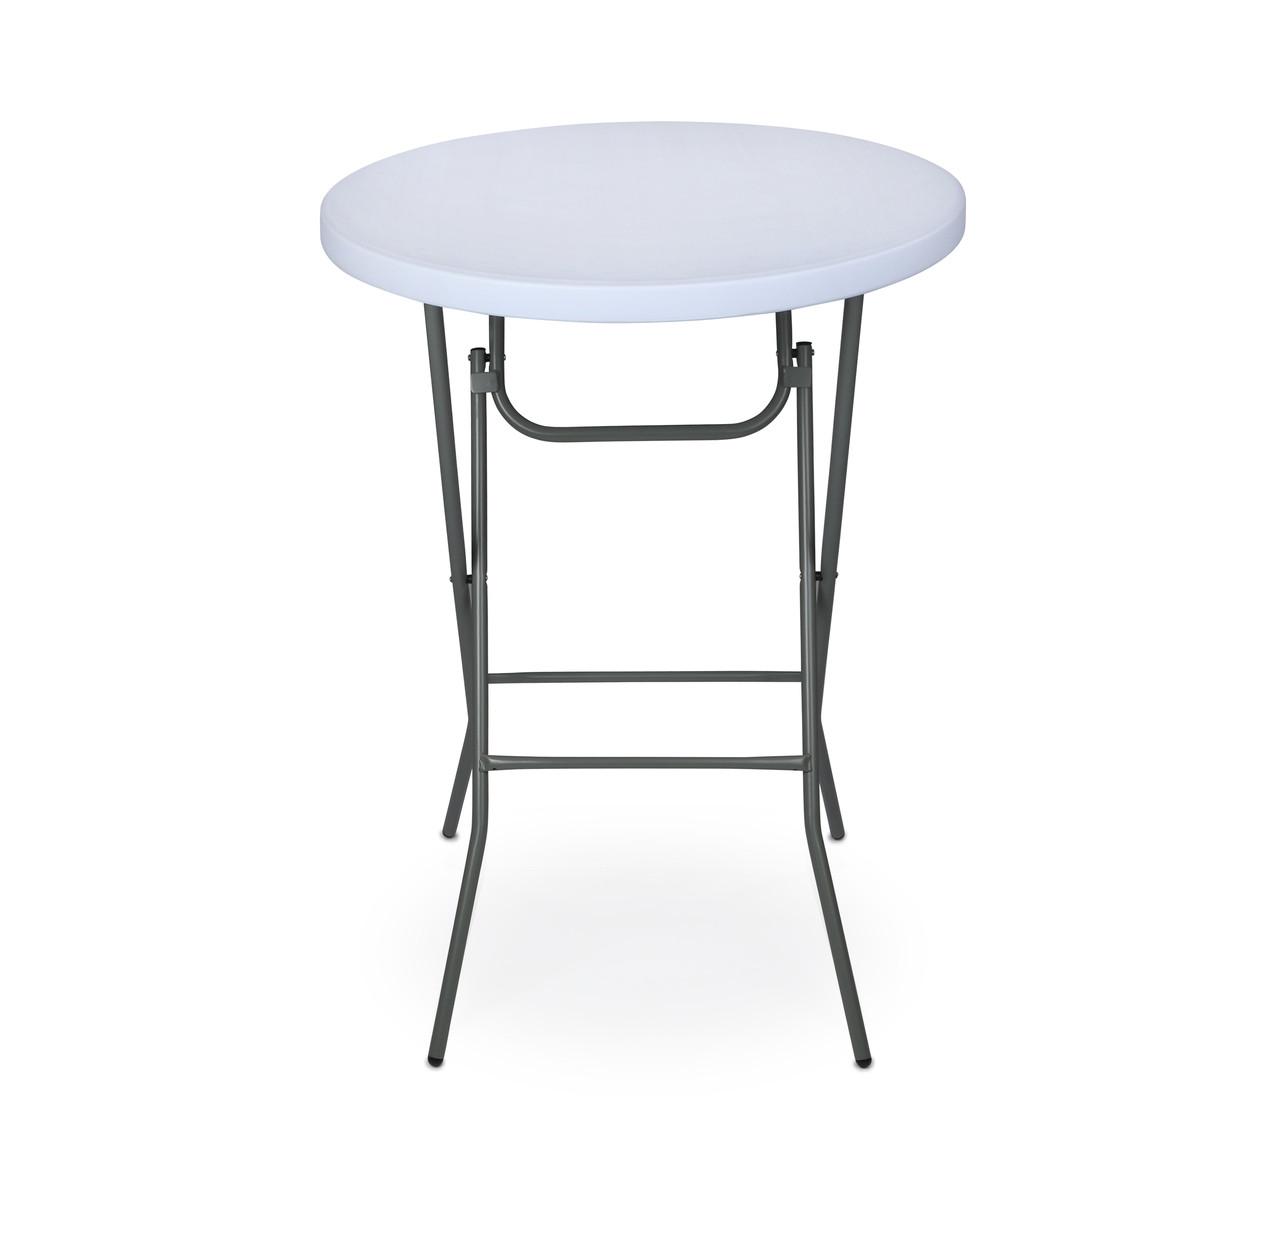 Rhinolite 32 Round Plastic Folding High Top Cocktail Table 43 5